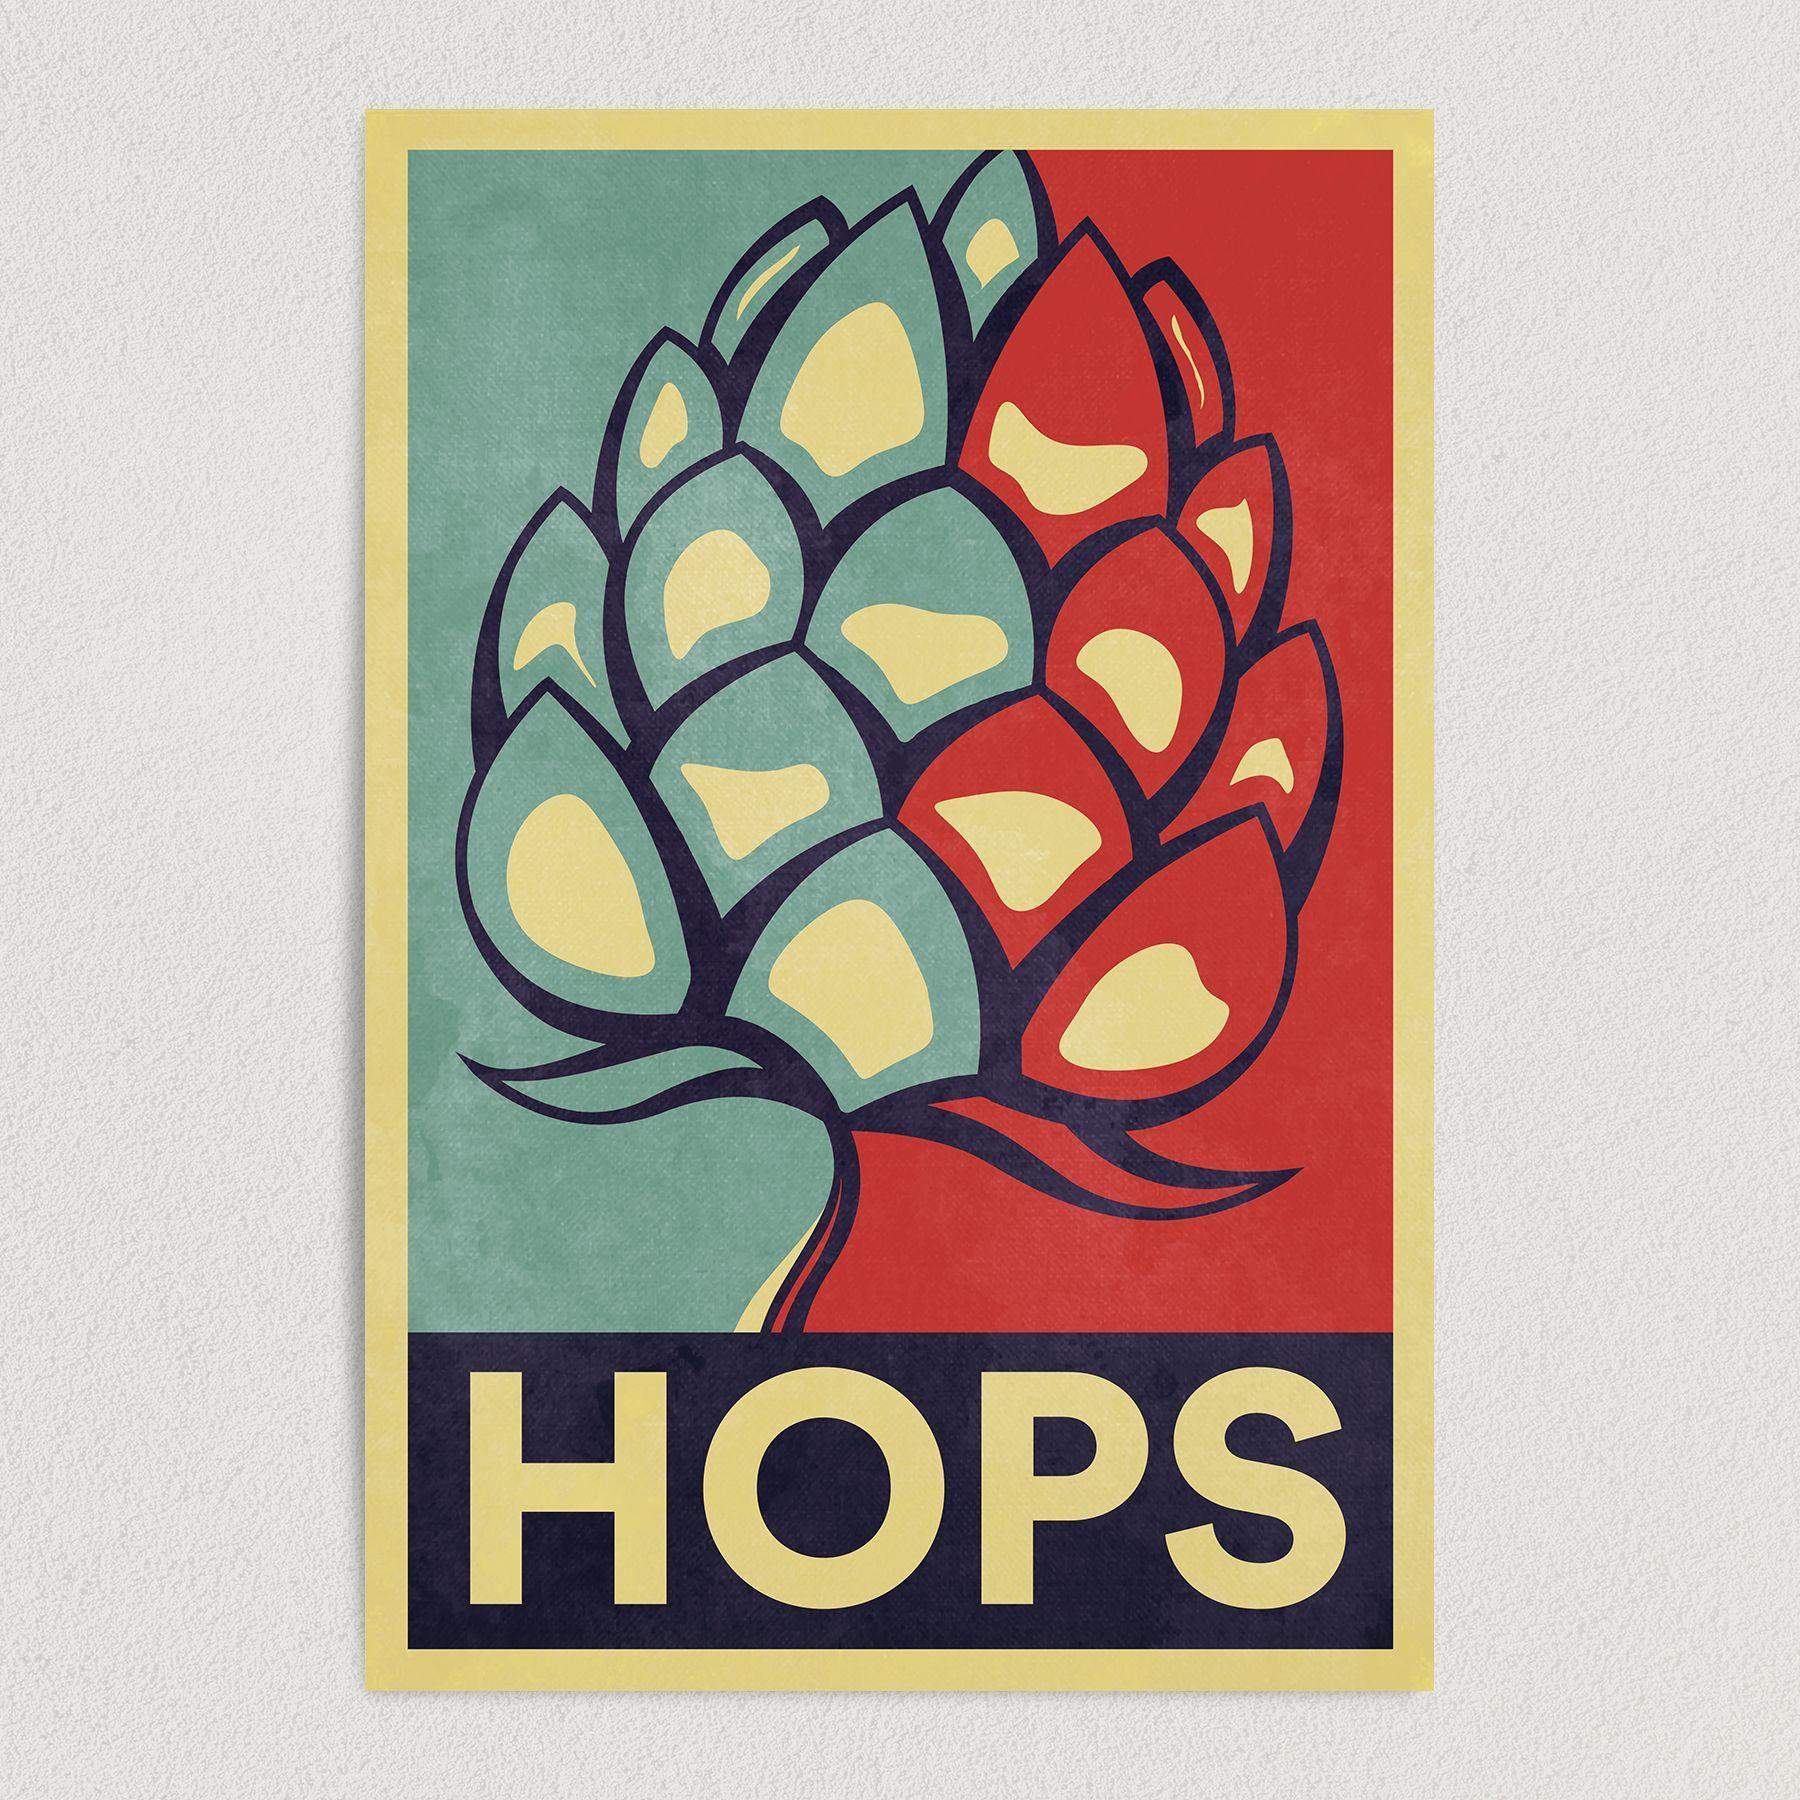 Hops for Beer Campaign Art Print Poster 12″ x 18″ Wall Art AL1101